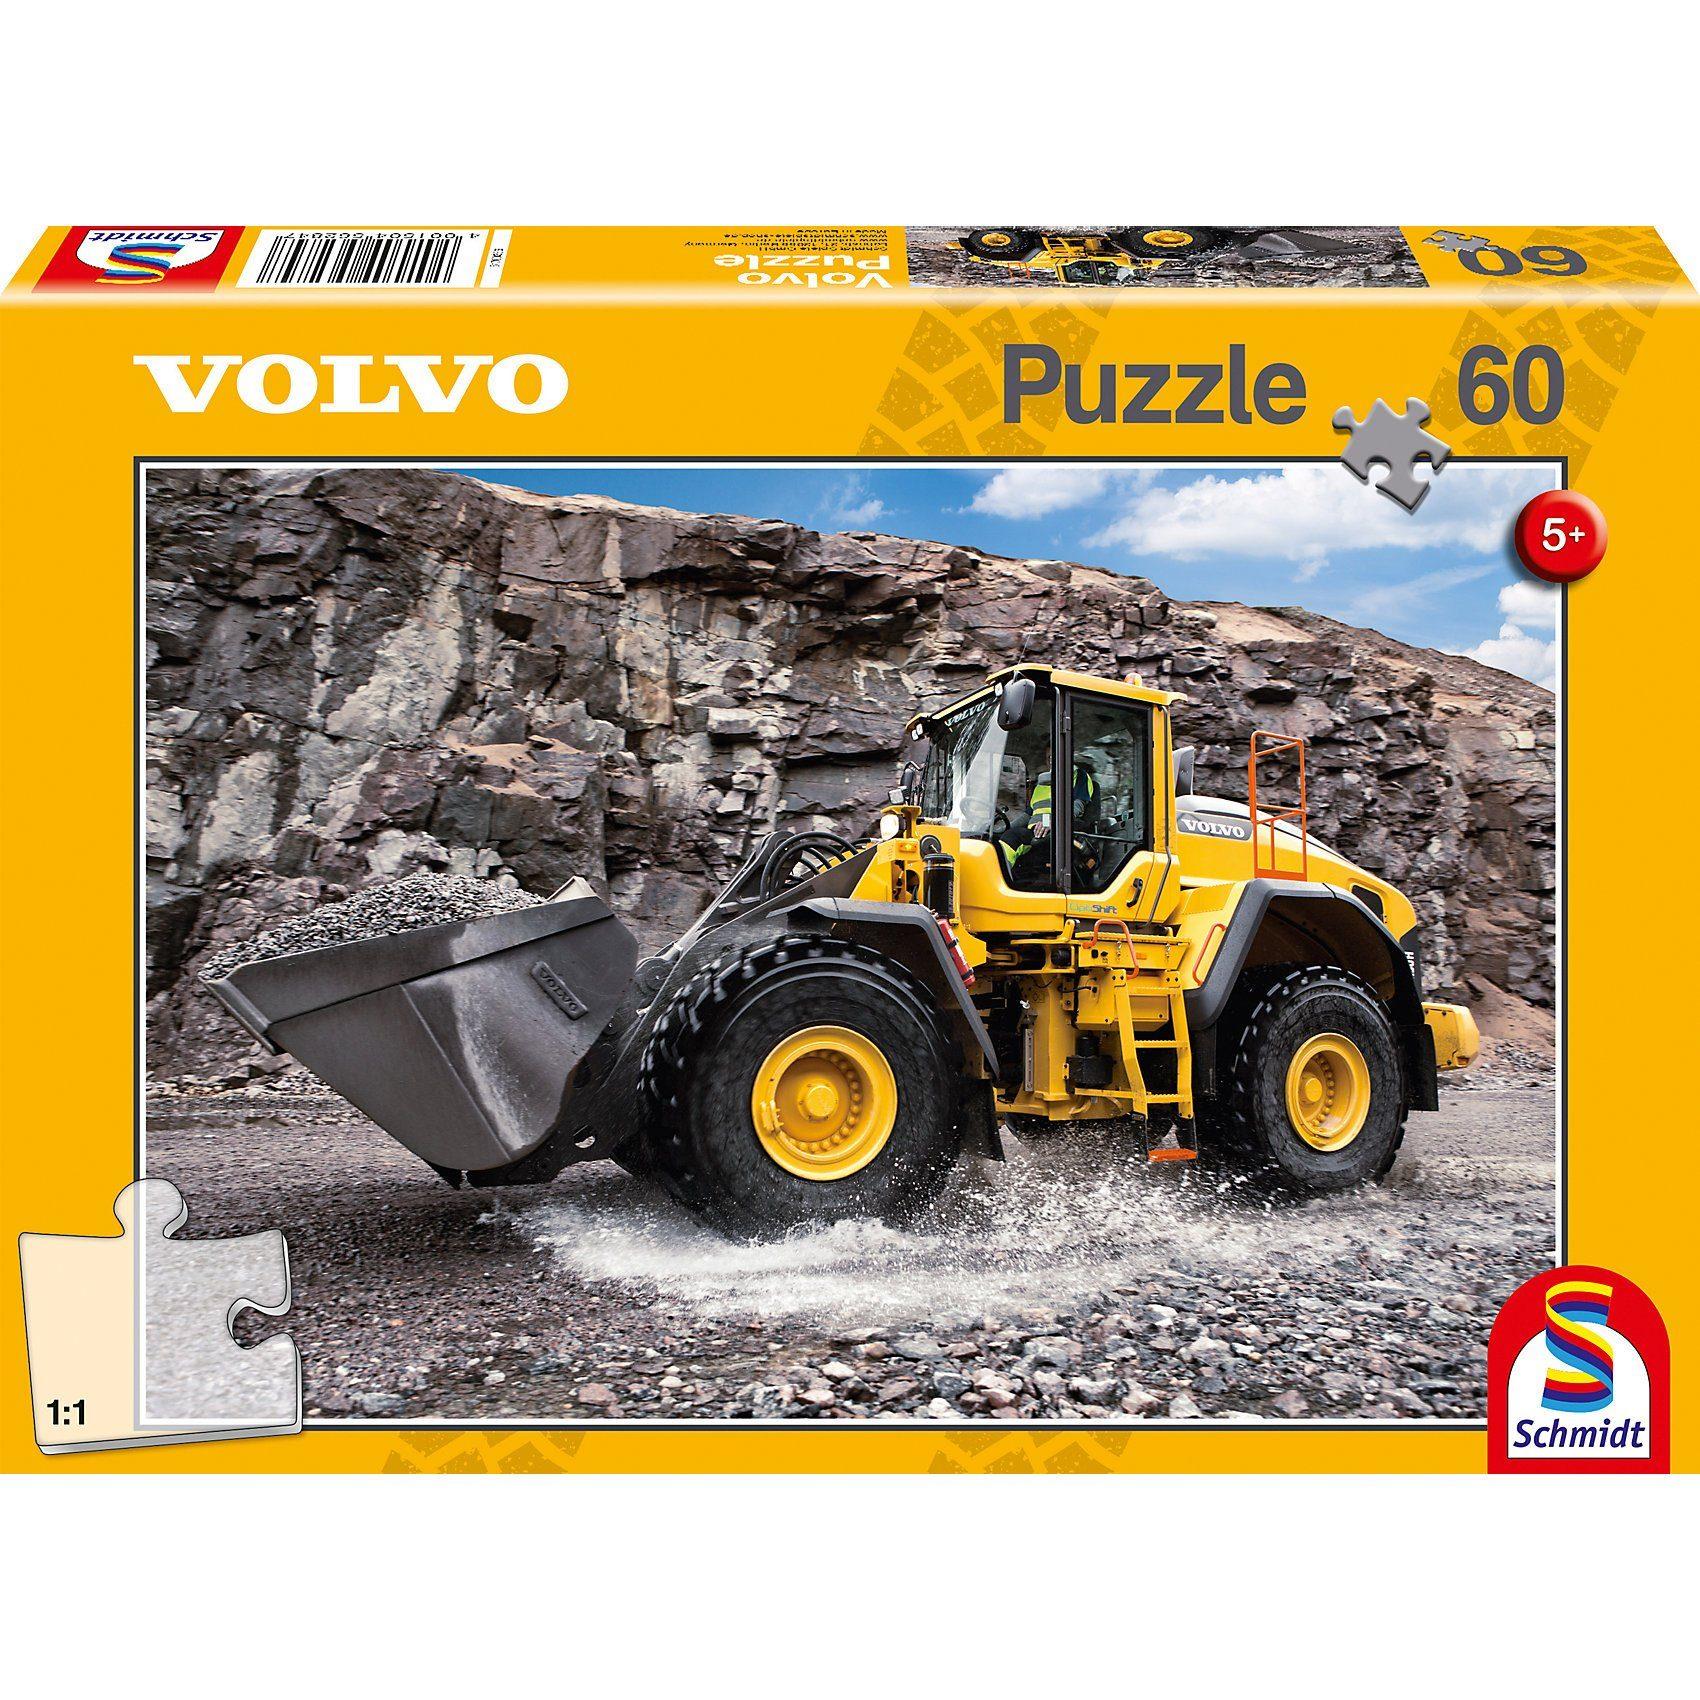 Schmidt Spiele Puzzle 60 Teile Volvo L150H